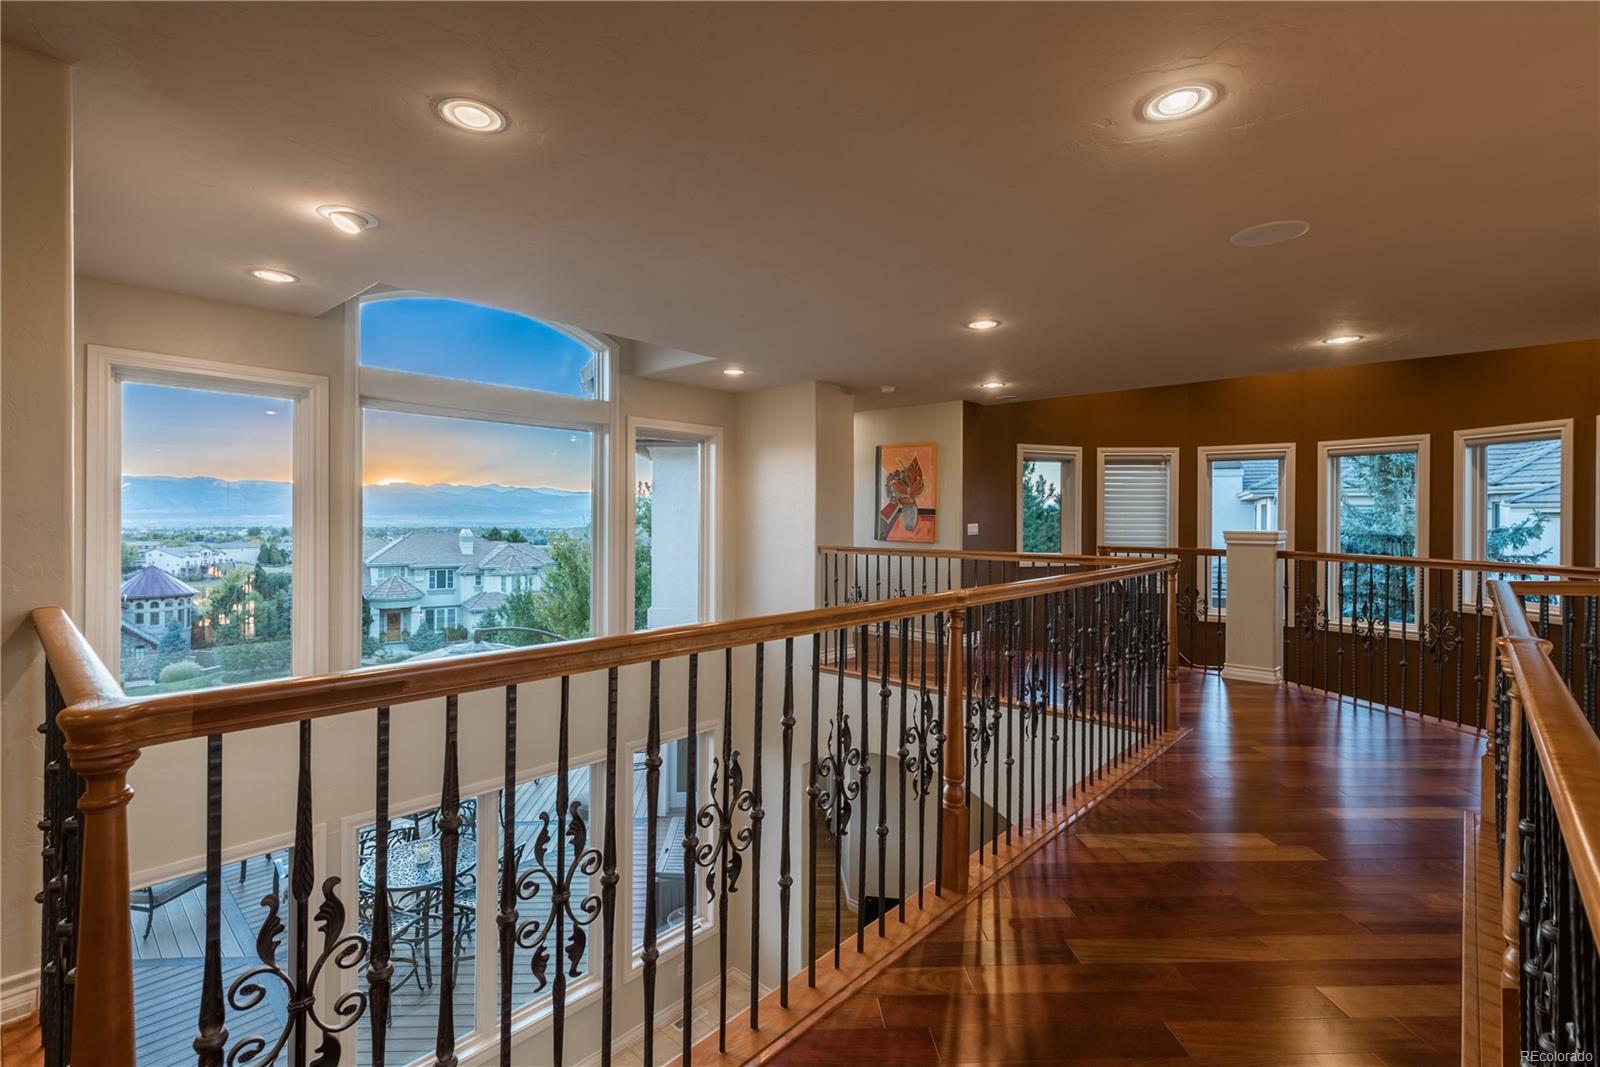 Beautiful upper hallway offers amazing views.